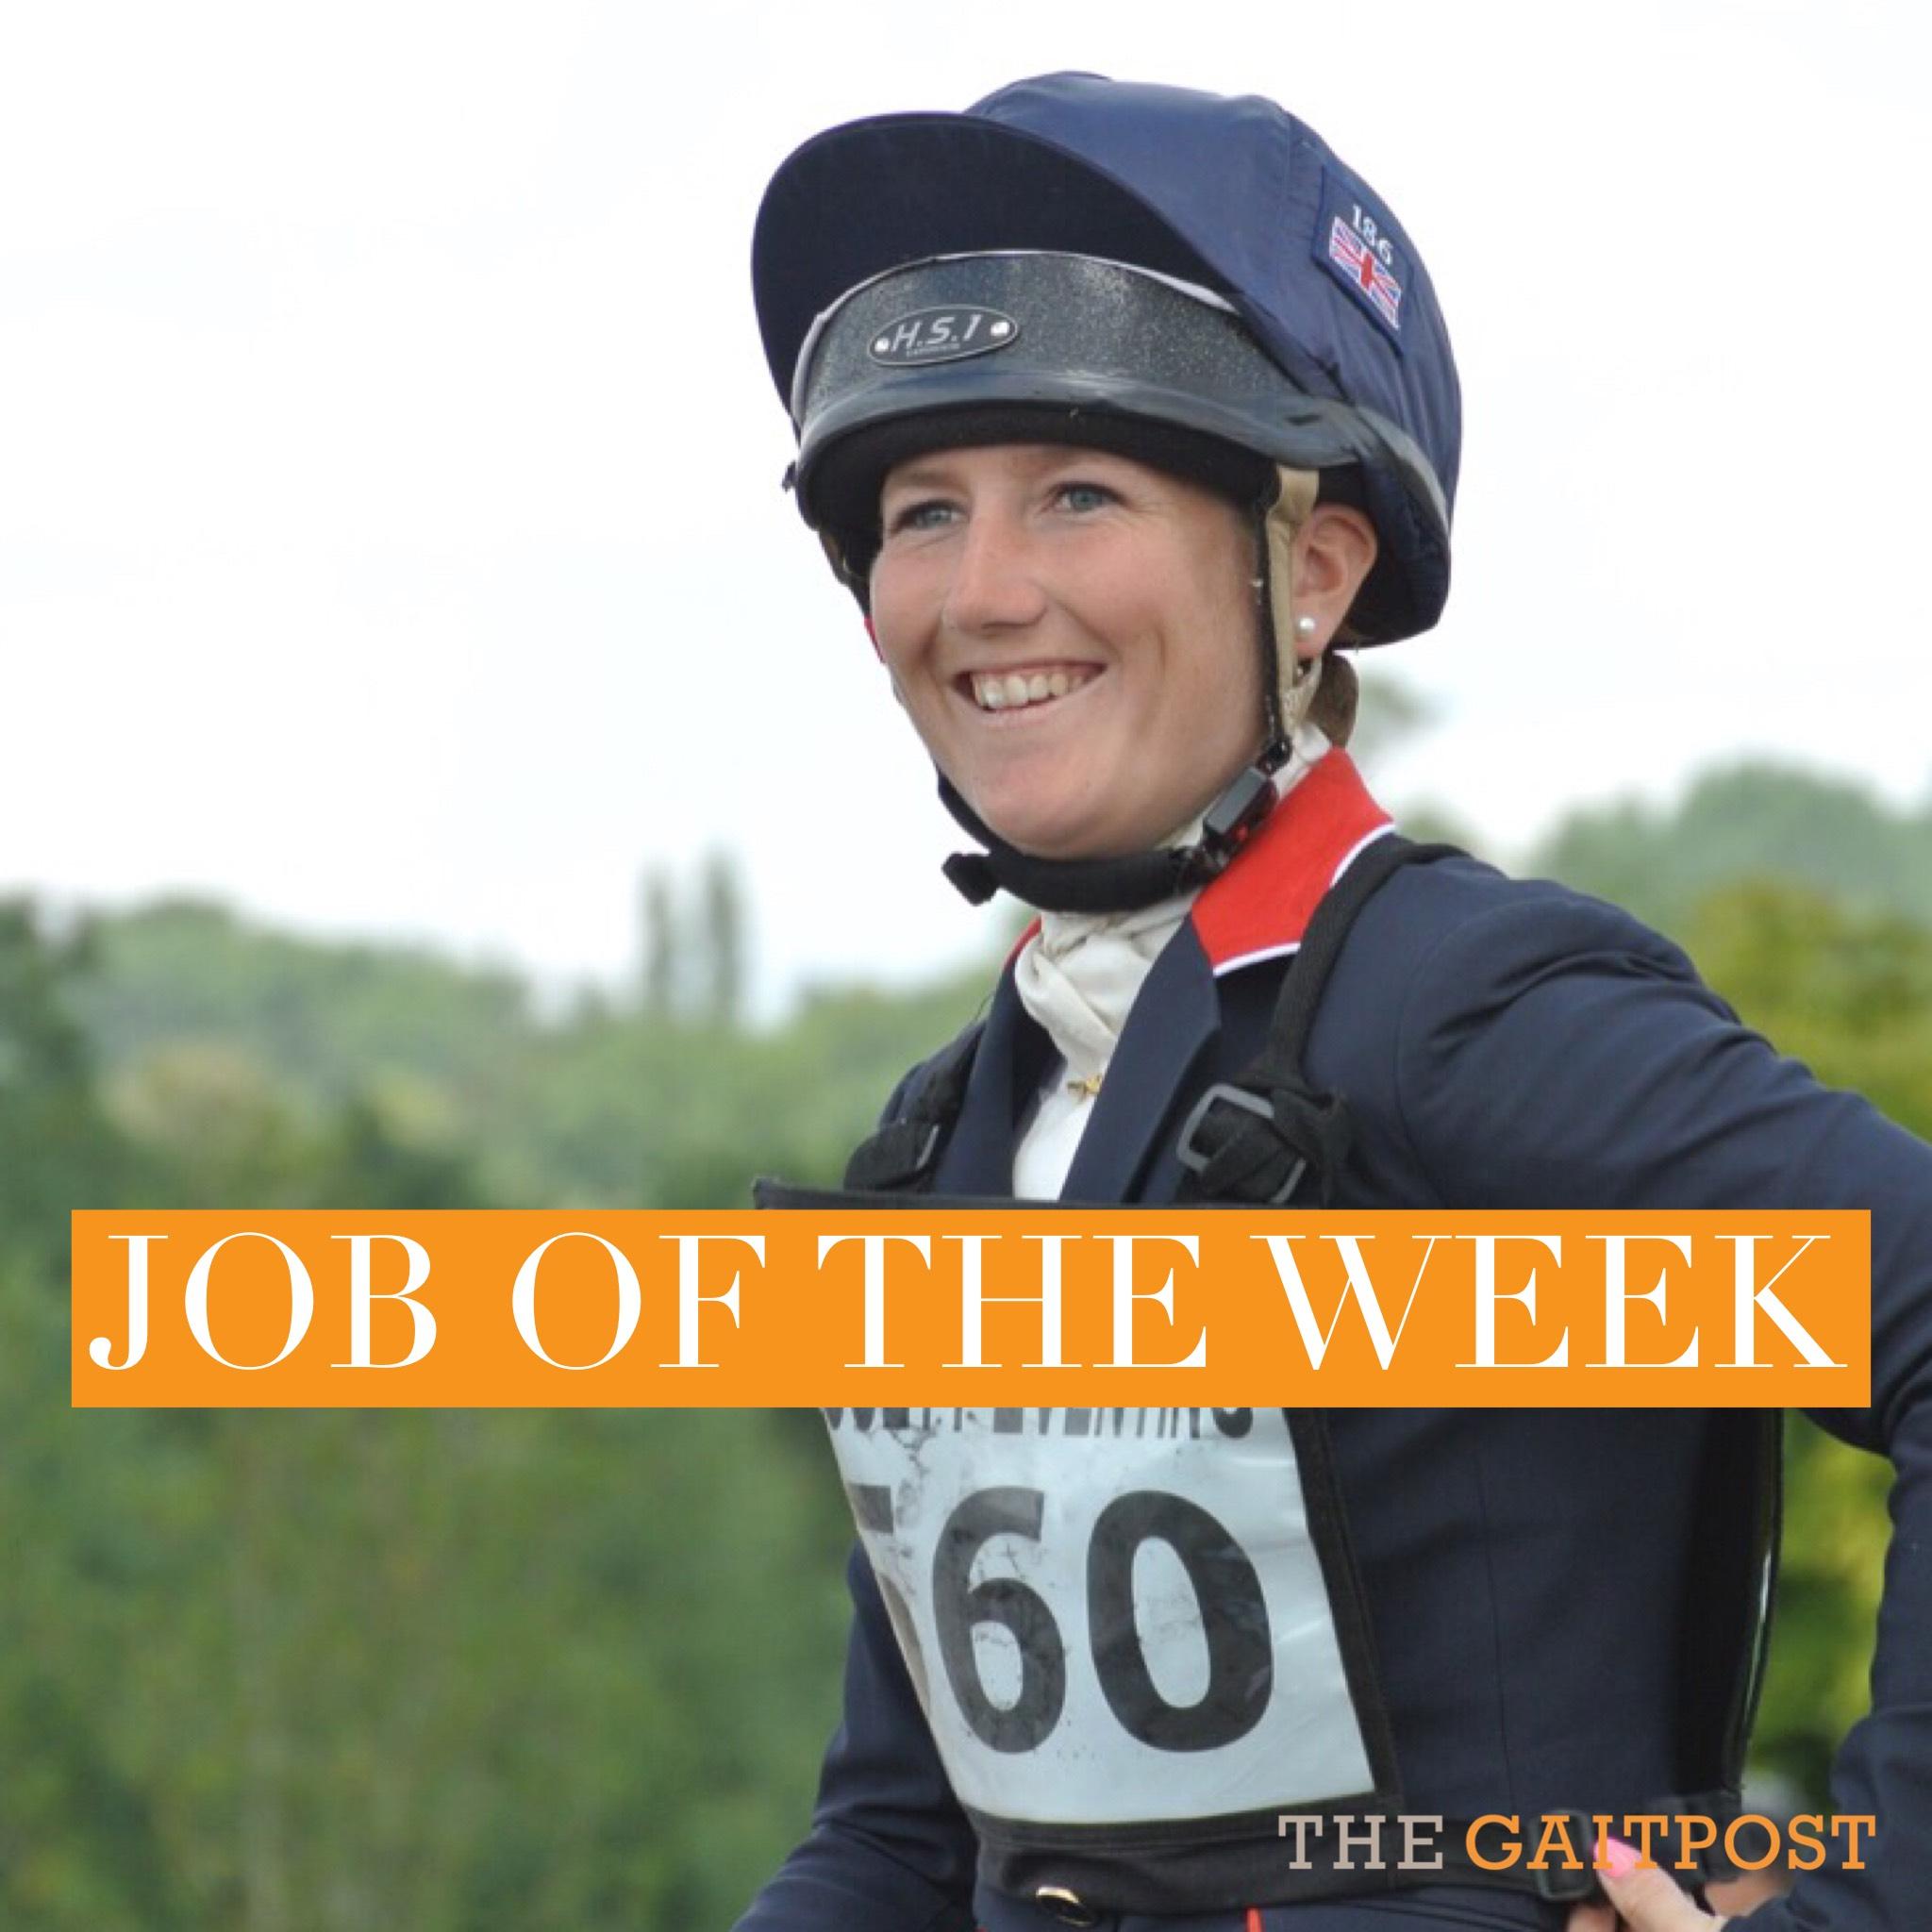 Laura Collett job of the week